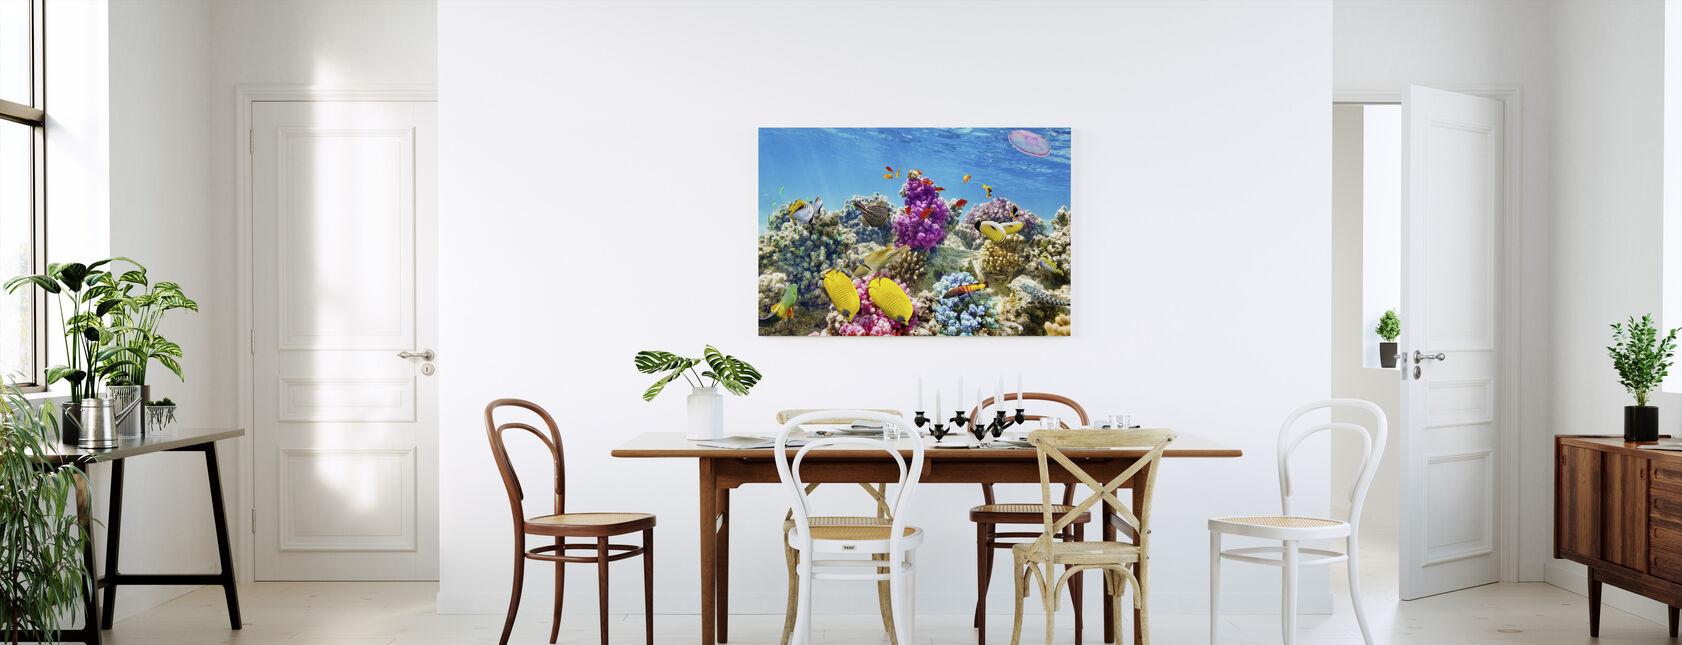 Under havet - Canvastavla - Kök